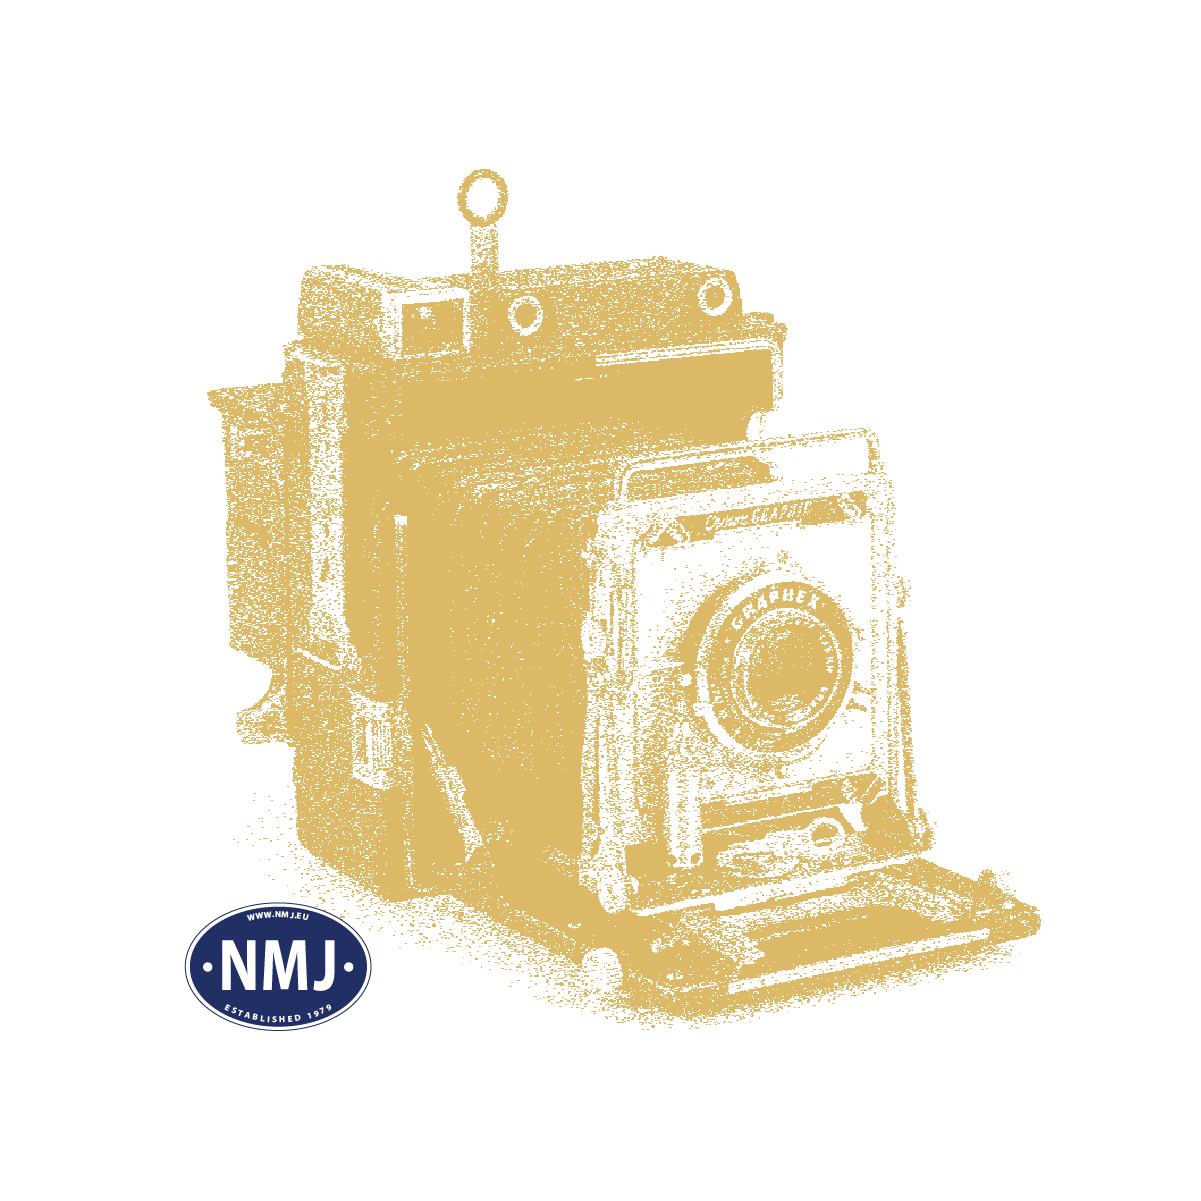 NMJT106.412 - NMJ Topline OBS B3-2 25597, Green